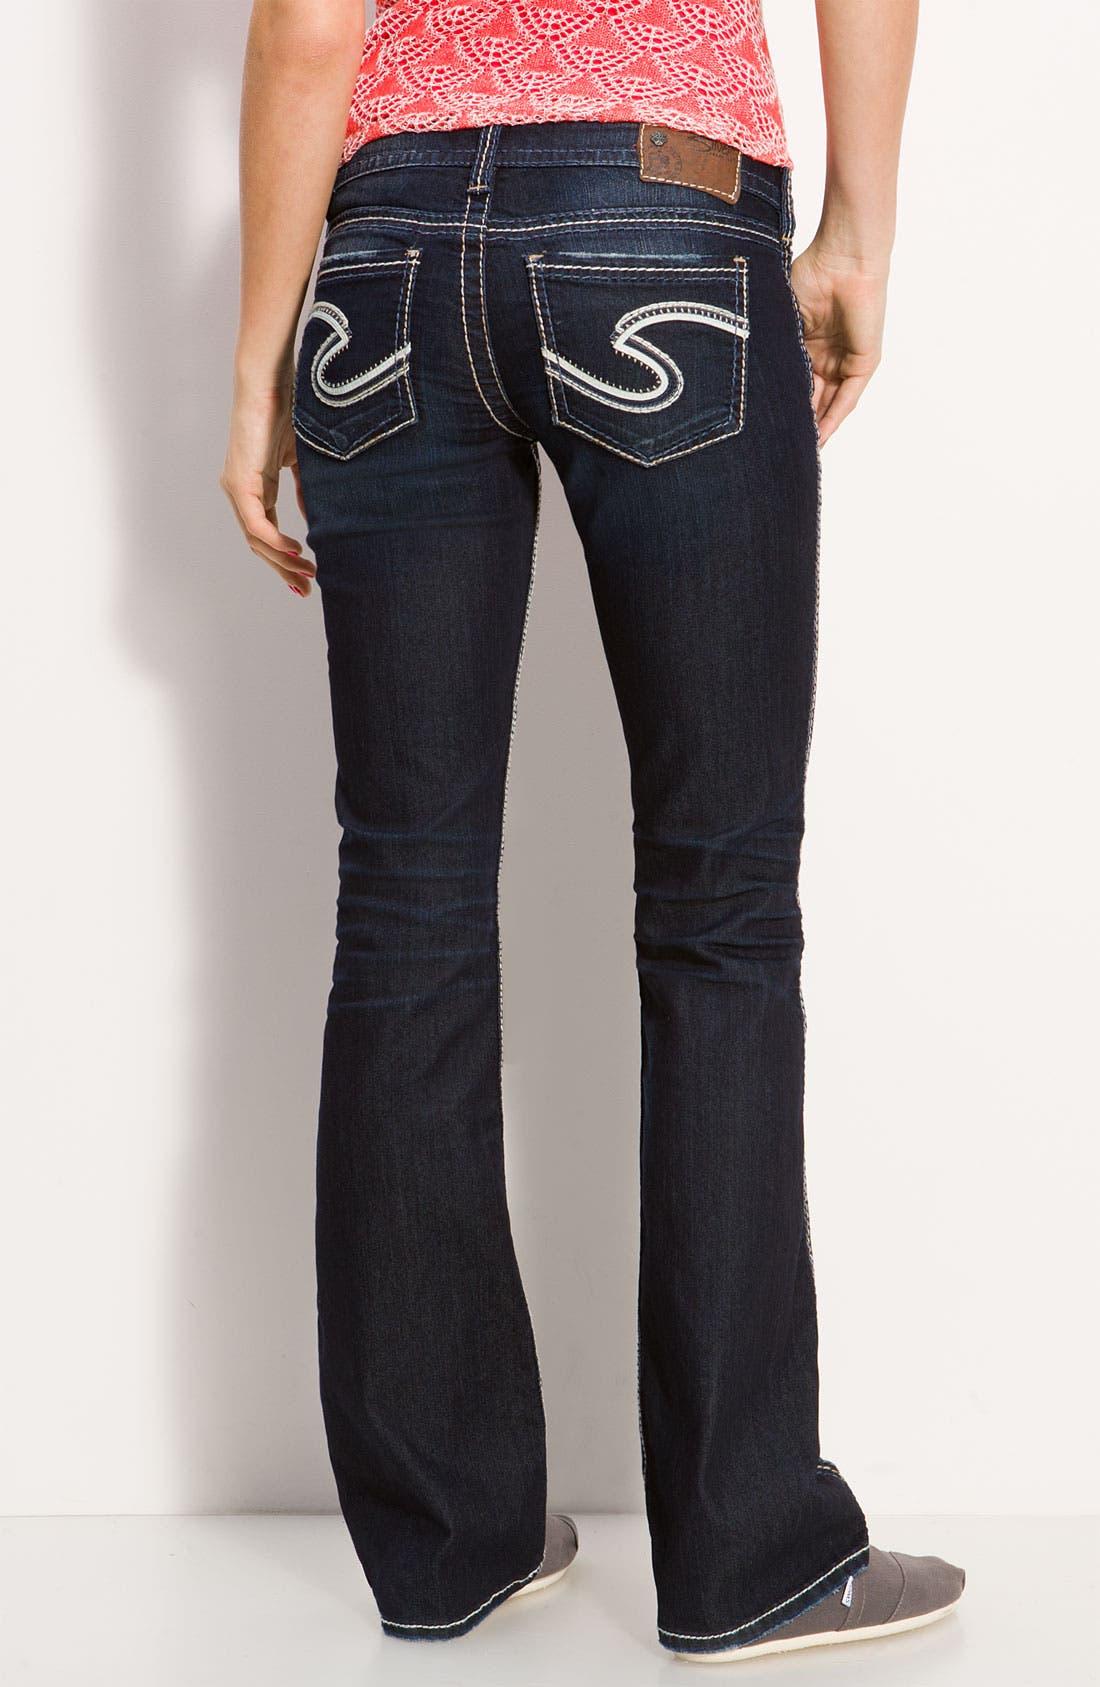 Alternate Image 1 Selected - Silver Jeans Co. 'Frances' Bootcut Jeans (Indigo Wash) (Juniors Regular & Long)